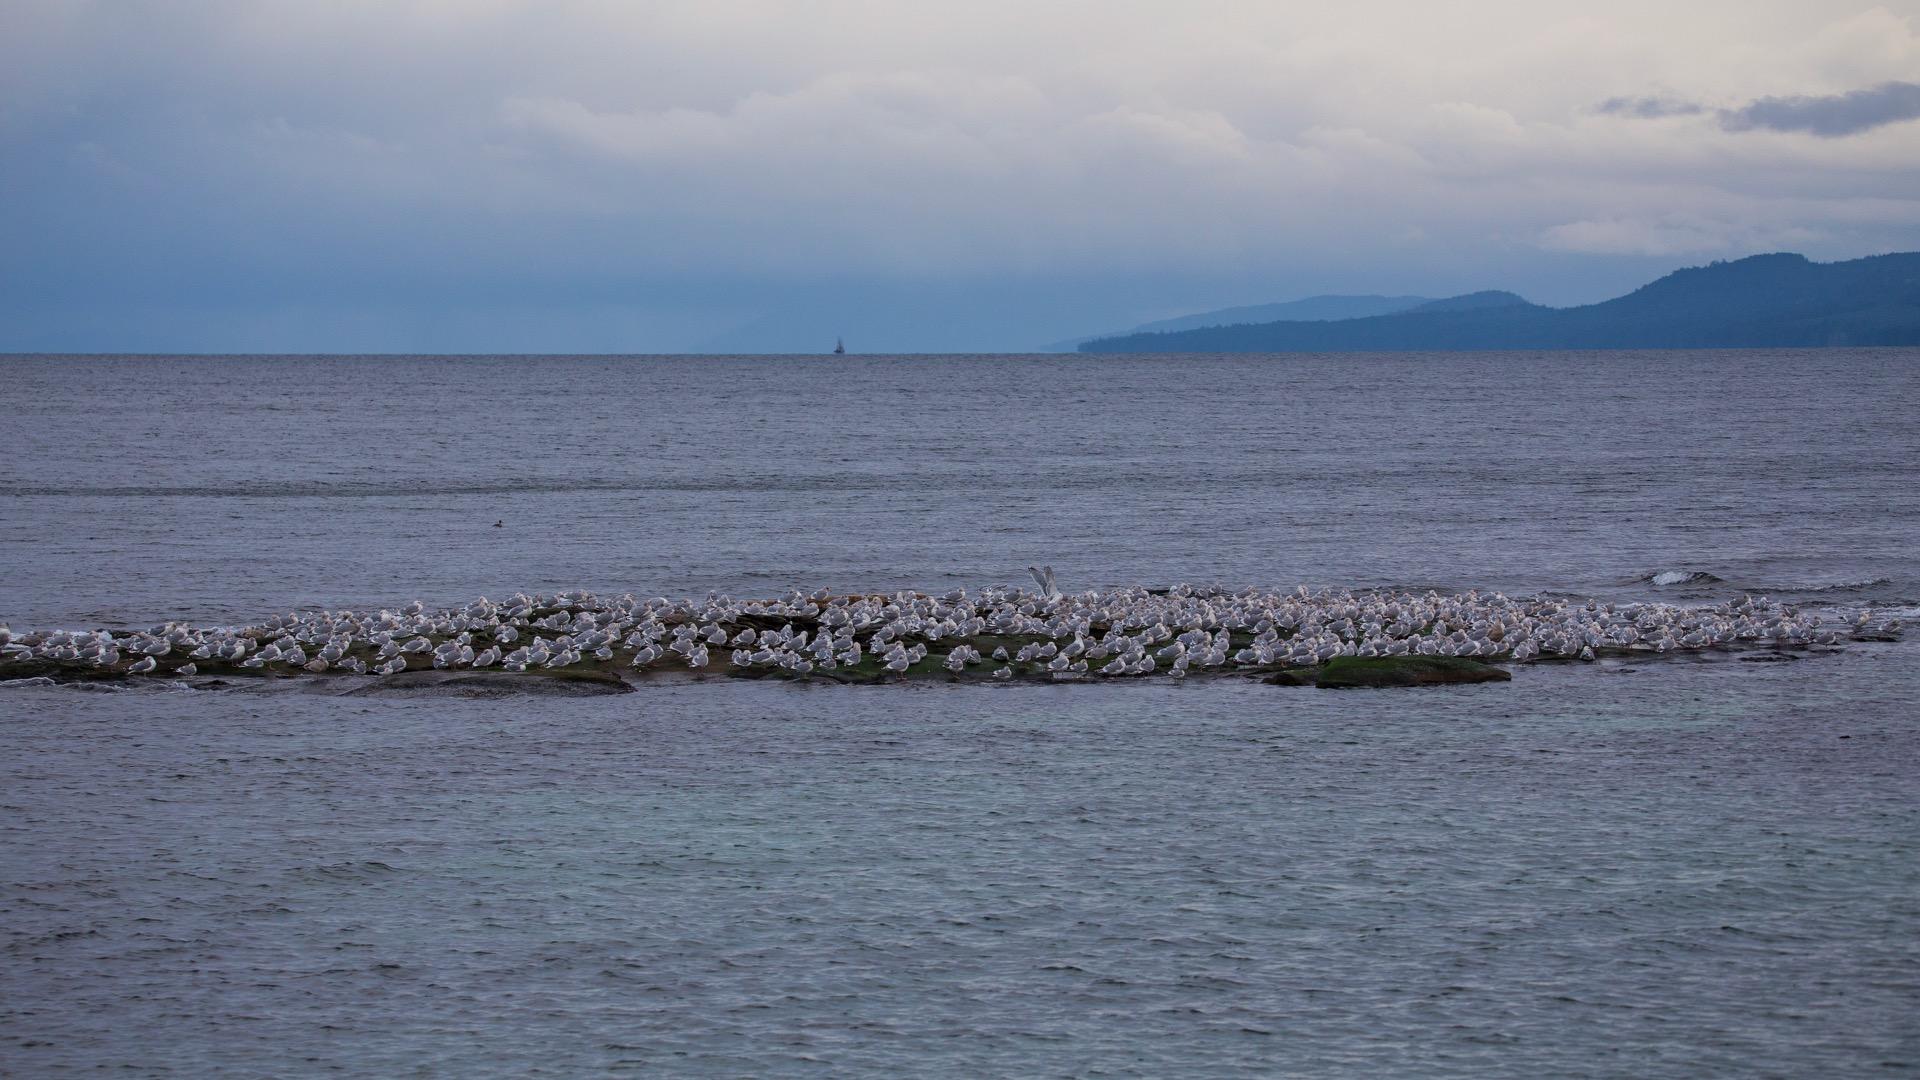 I know where al the seagulls go…